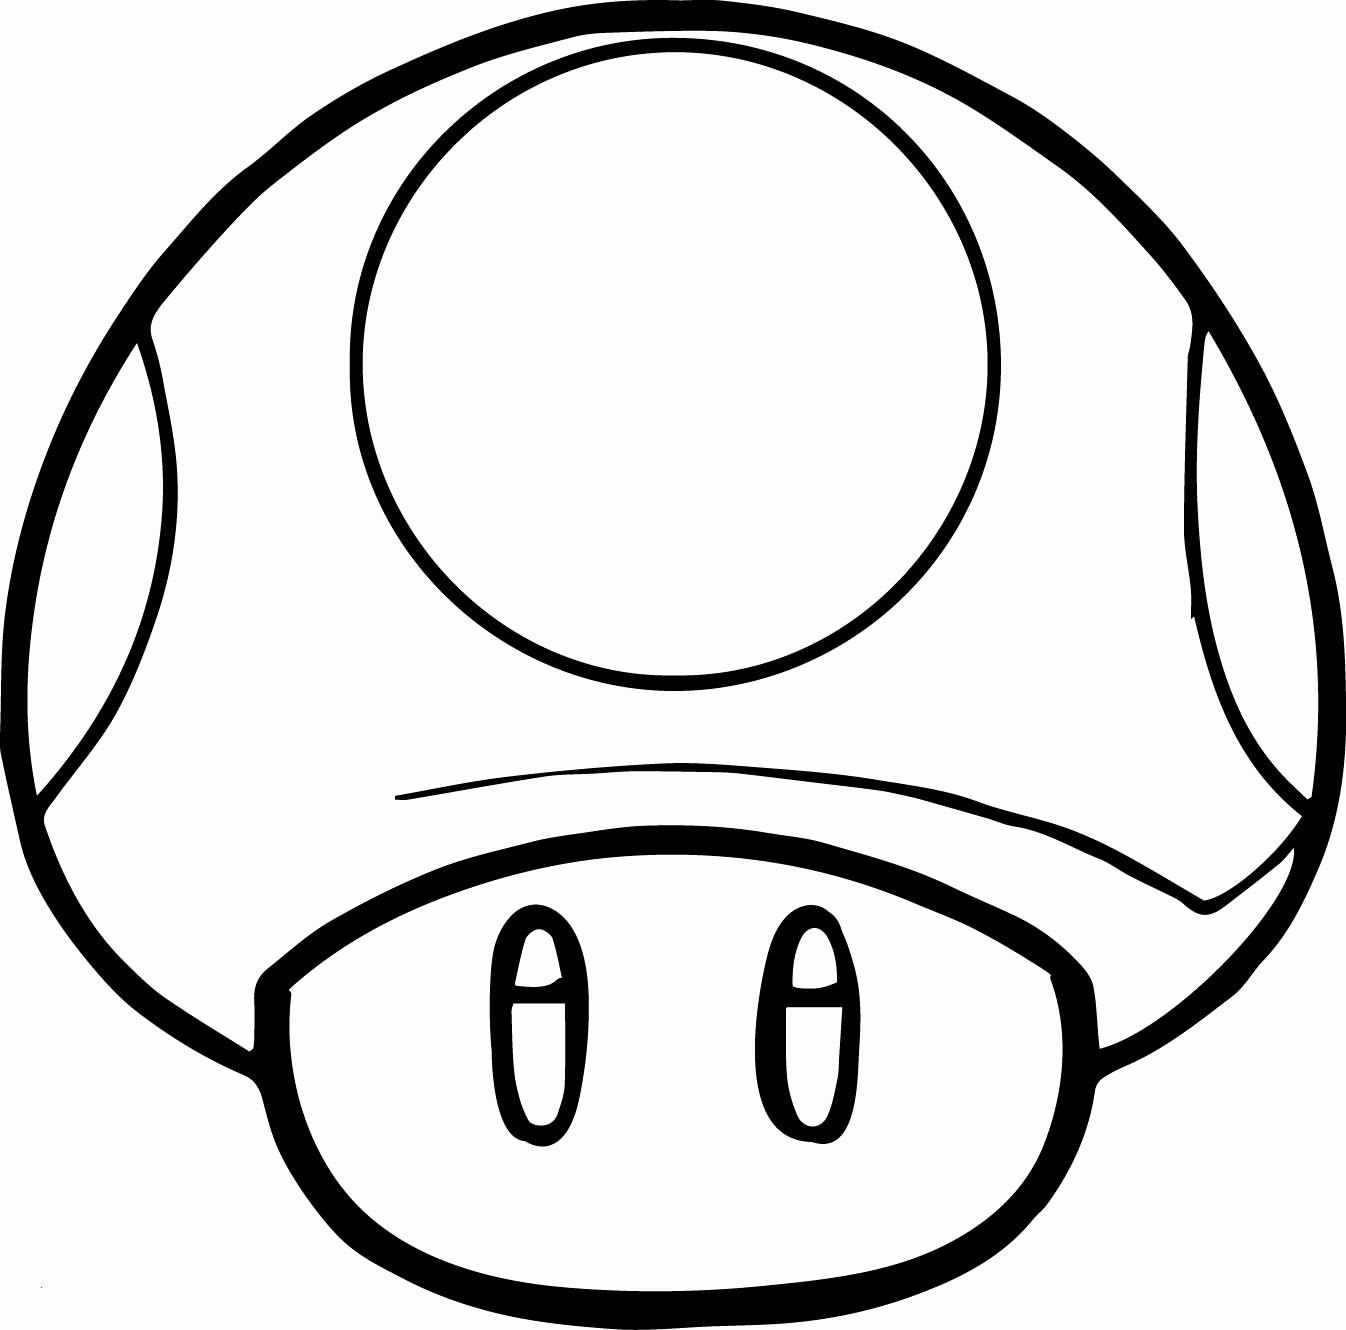 Super Mario Pilz Ausmalbilder Neu Pilze Bilder Zum Ausmalen Genial Wrestling Ausmalbilder Frisch Fotografieren